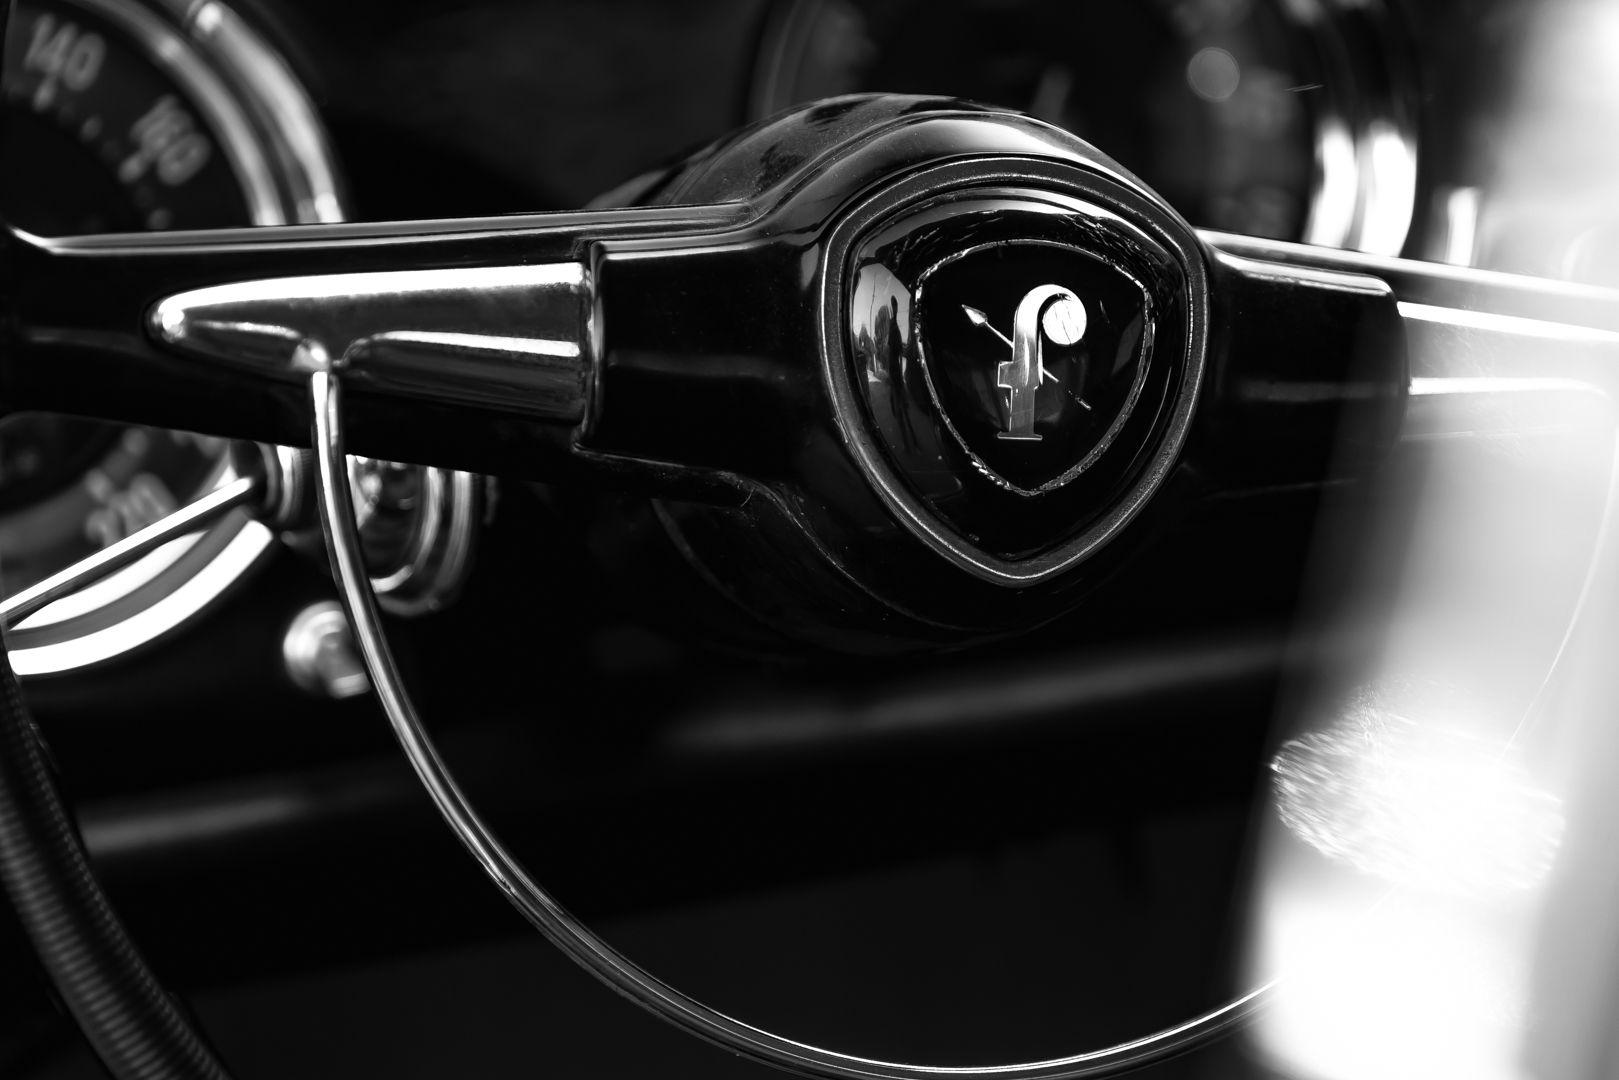 1960 Lancia Flaminia Coupé Pininfarina 2.5 76062